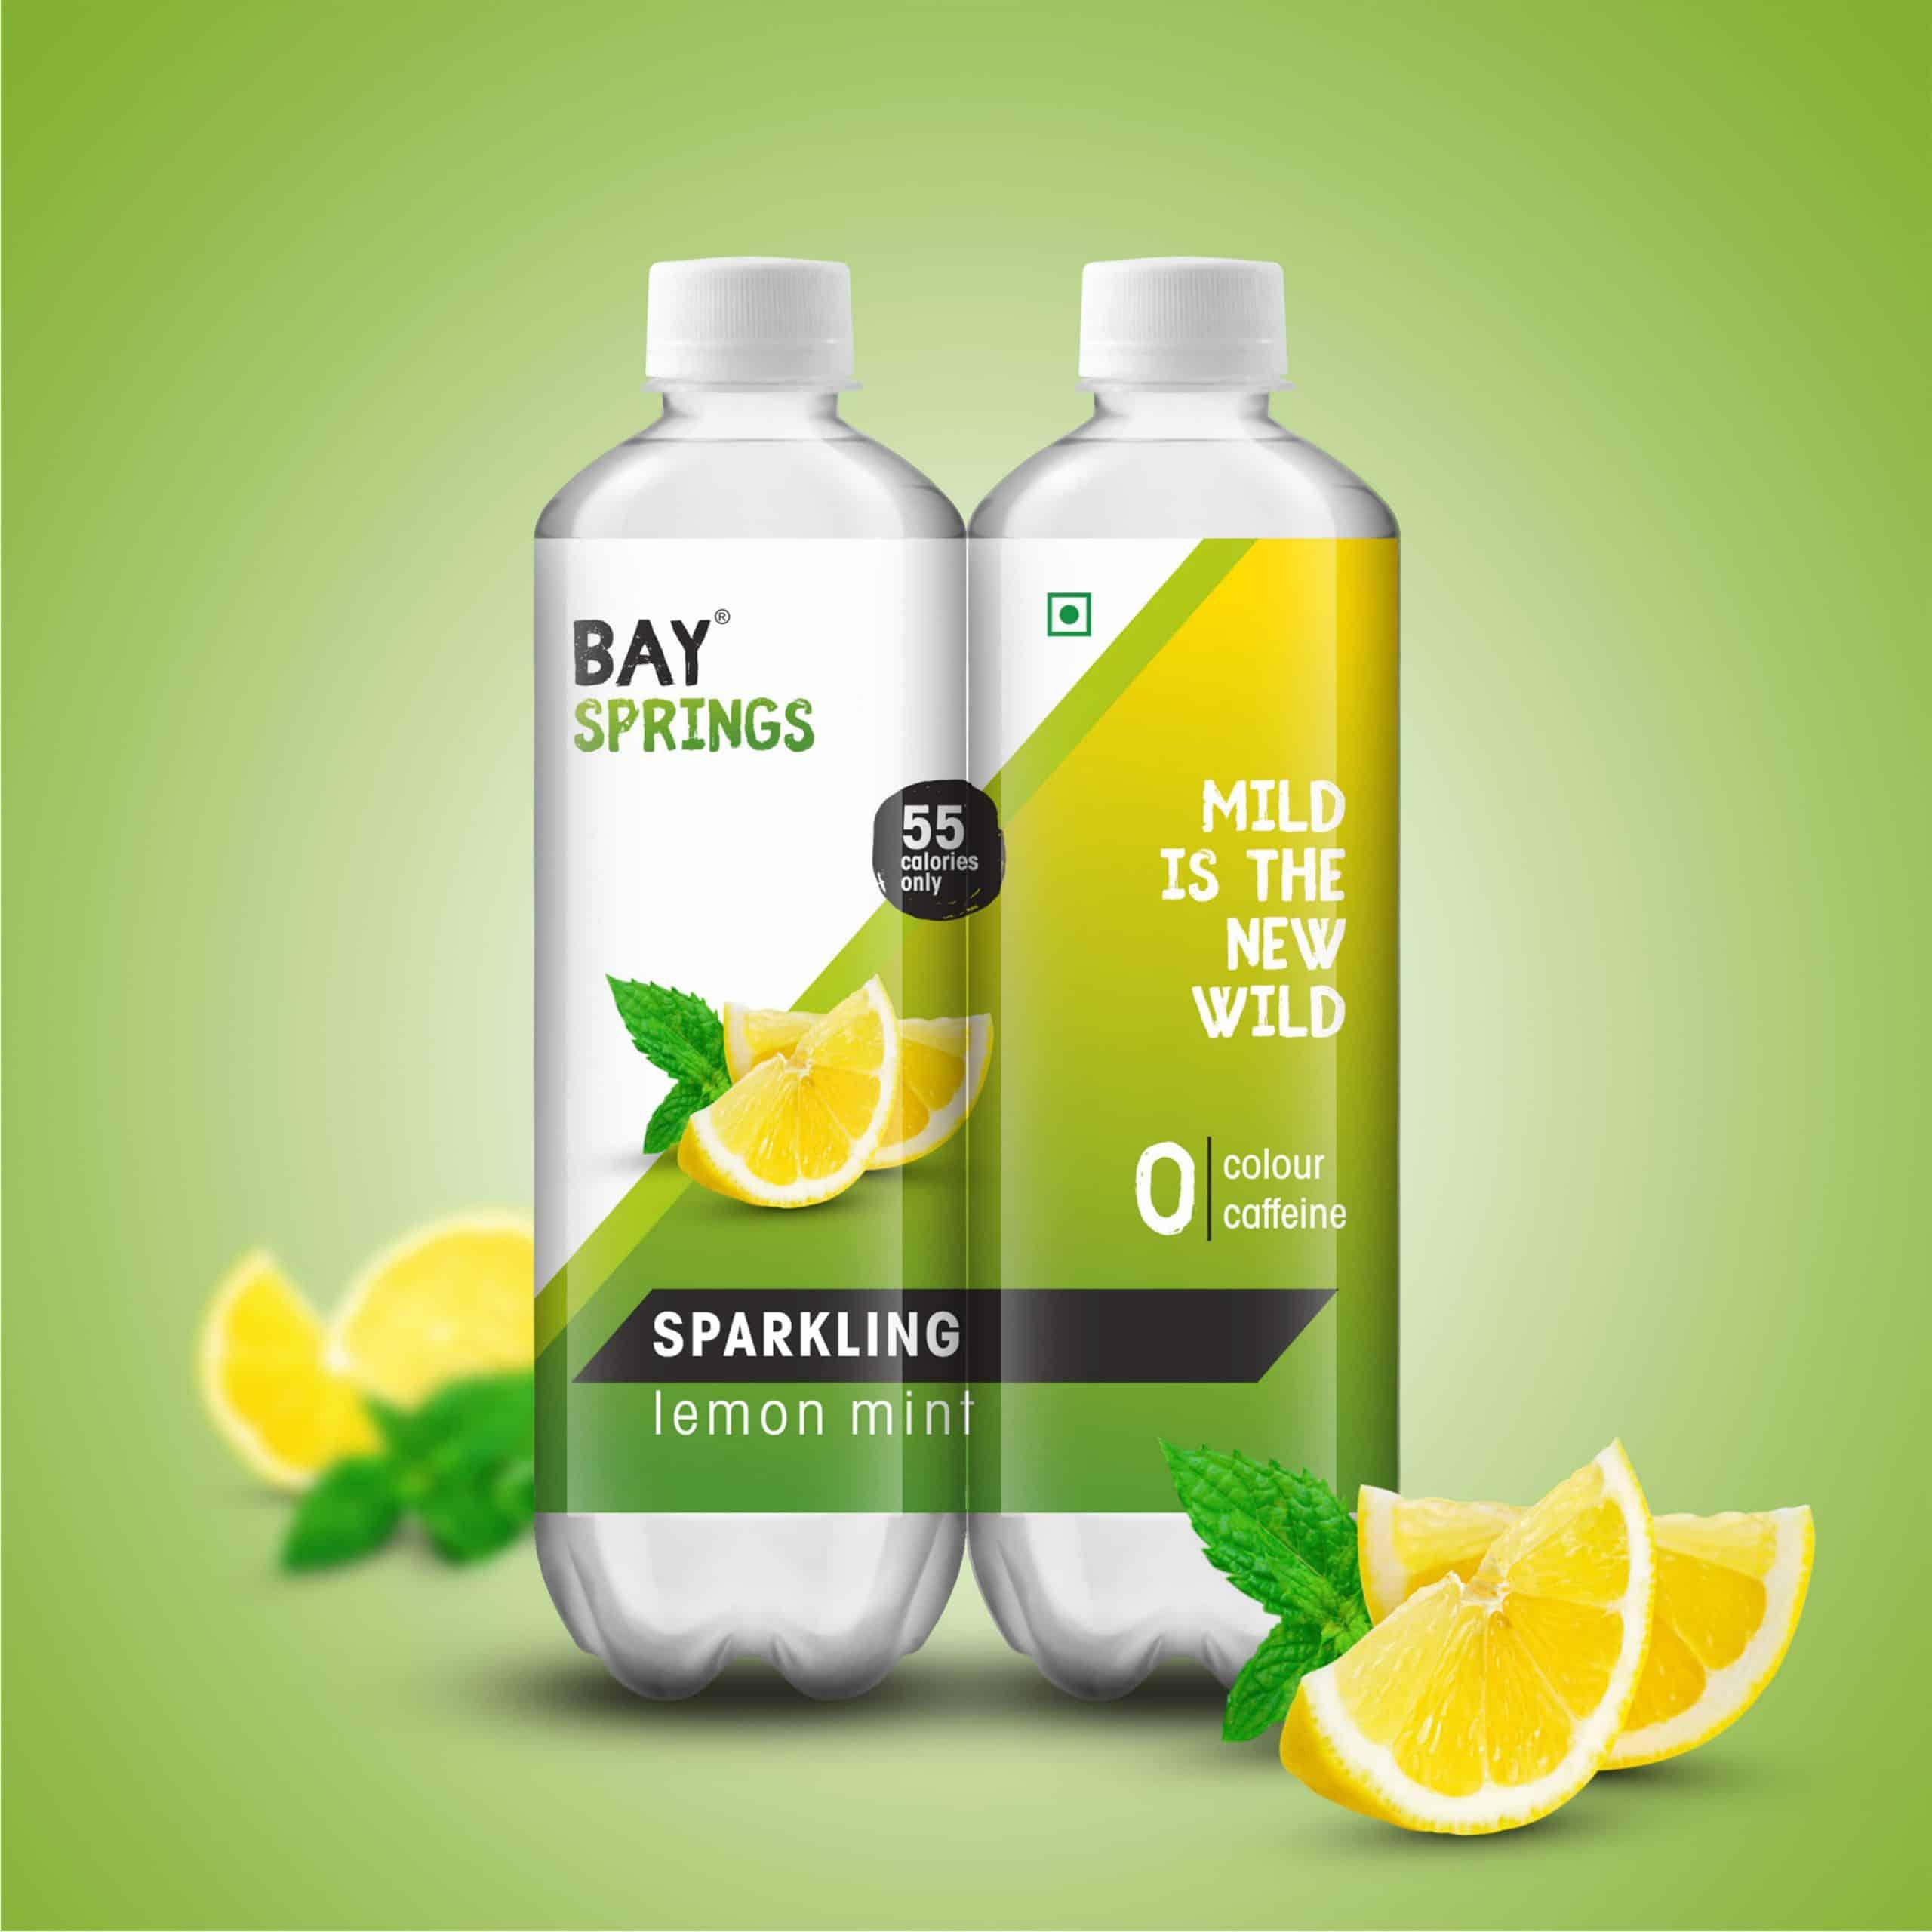 Aerated Drink Label Design